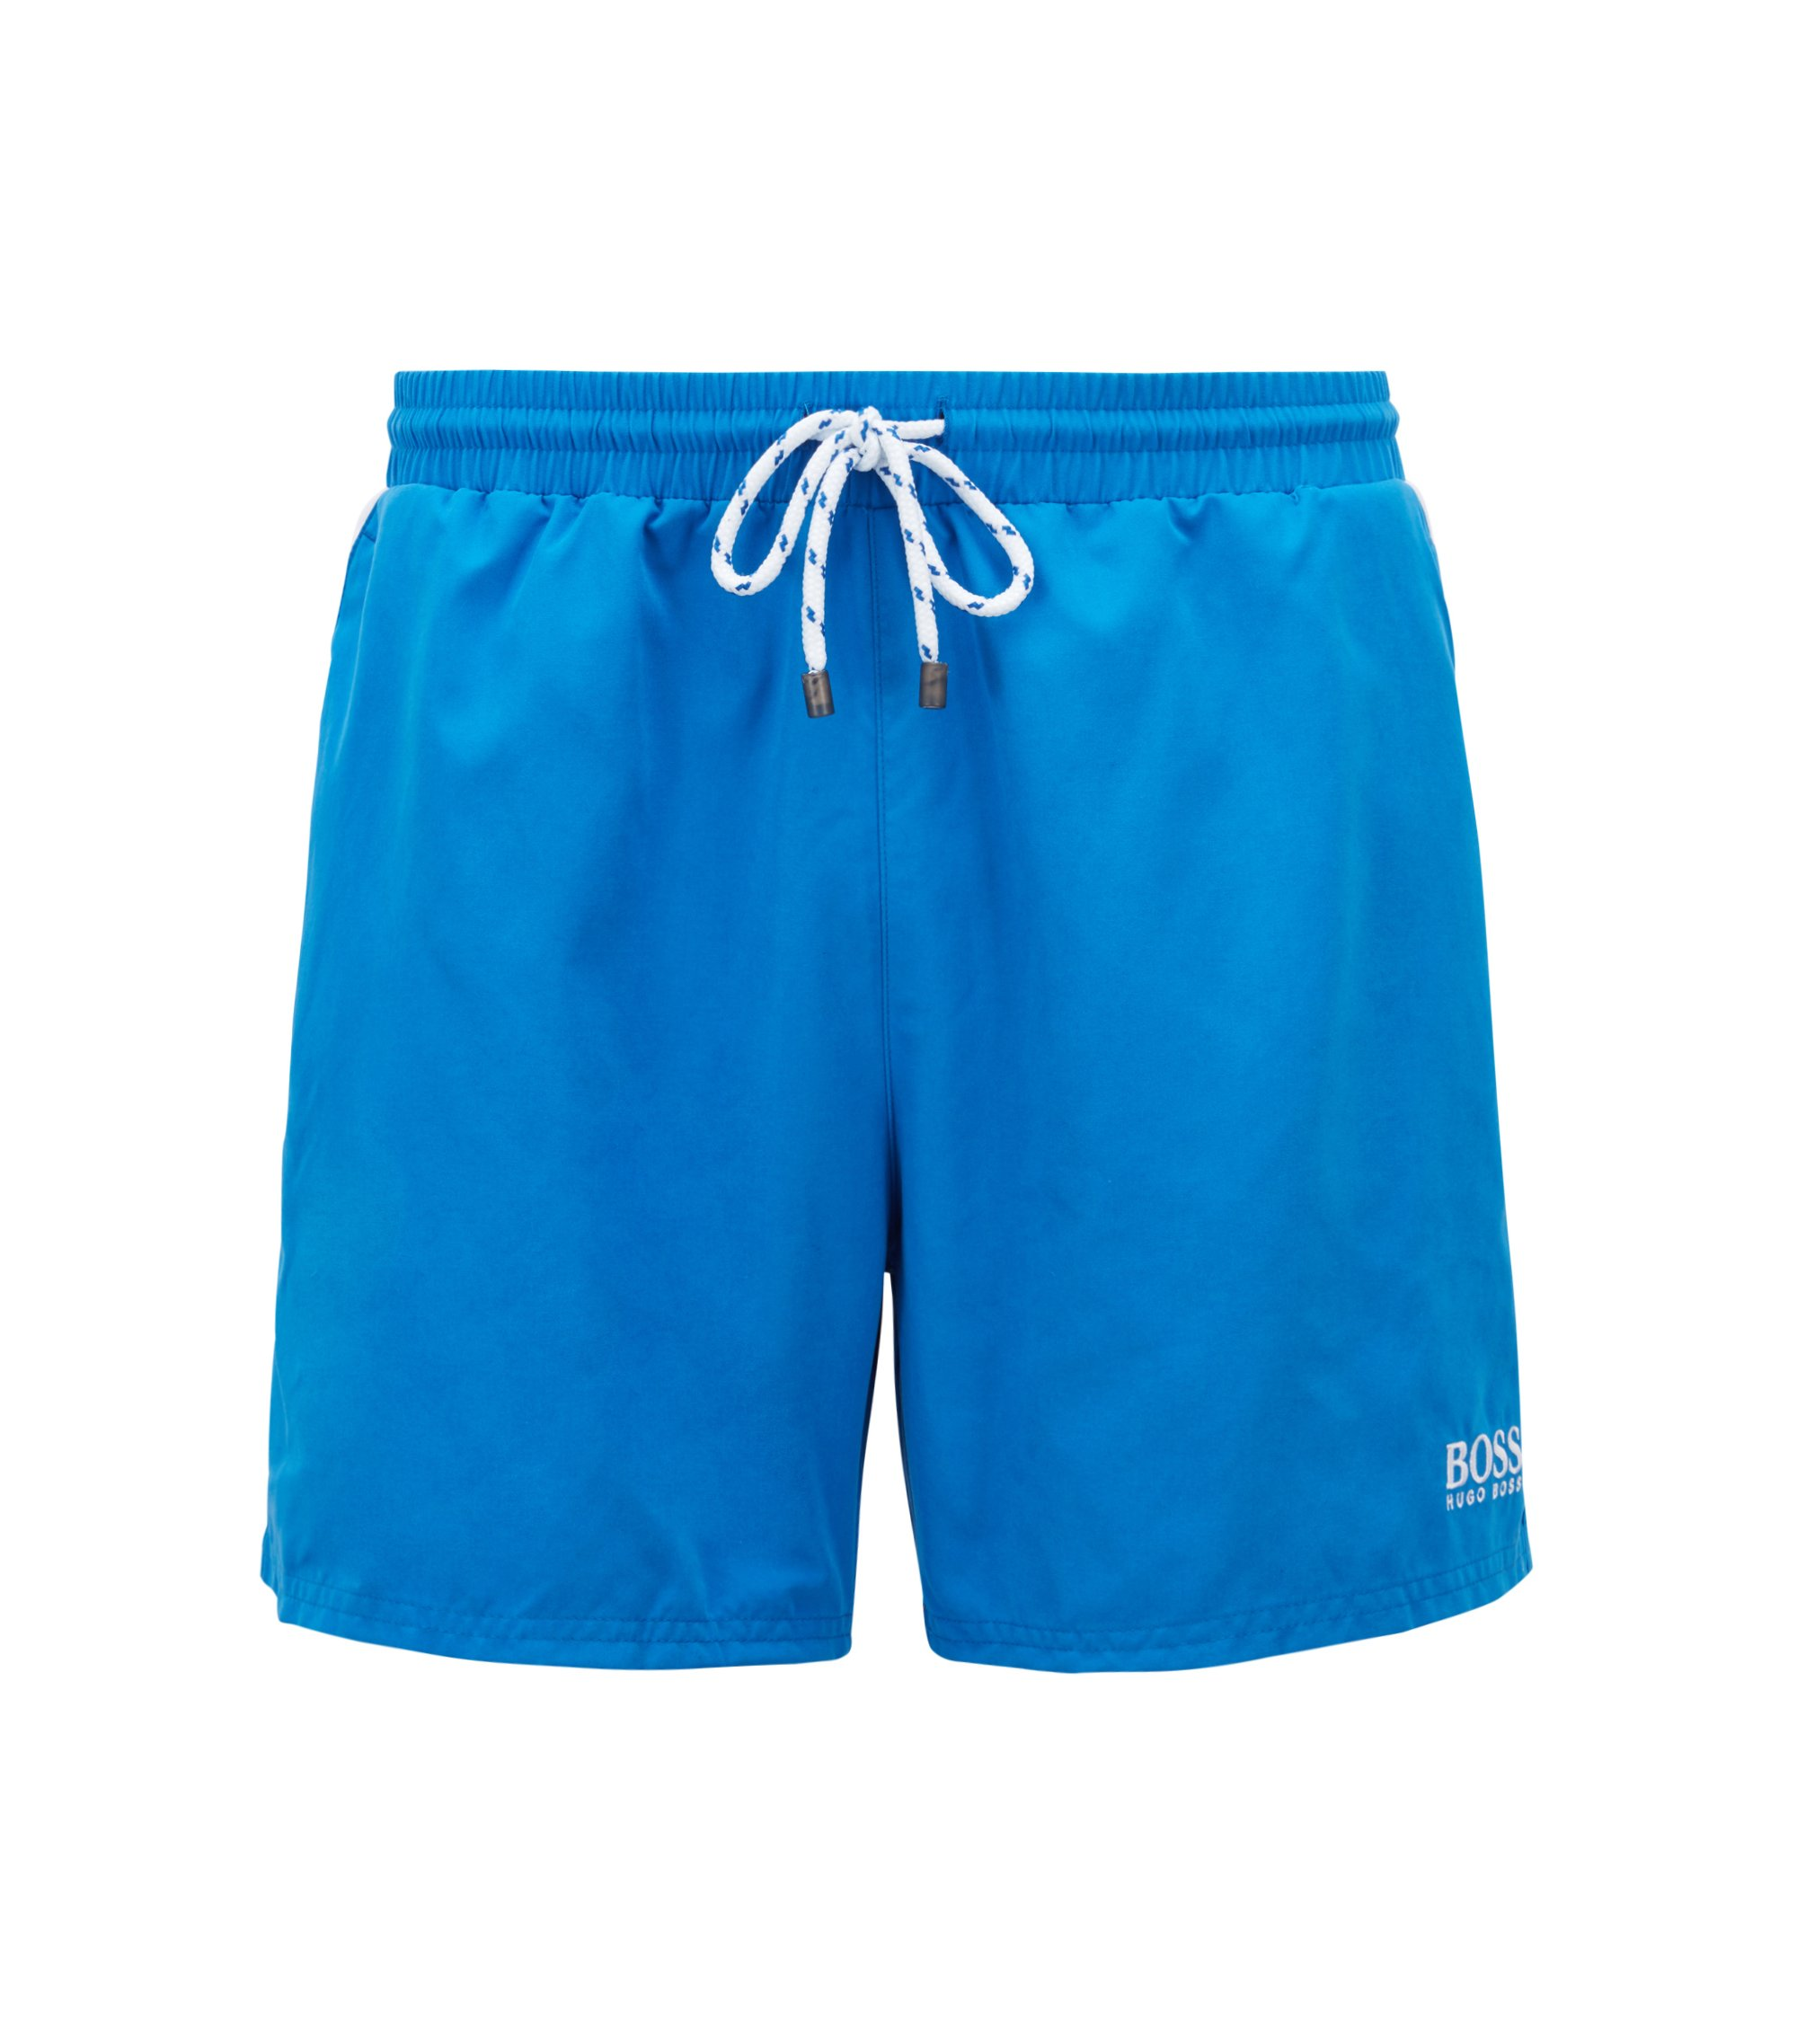 Sneldrogende zwemshort met geborduurd detail, Blauw